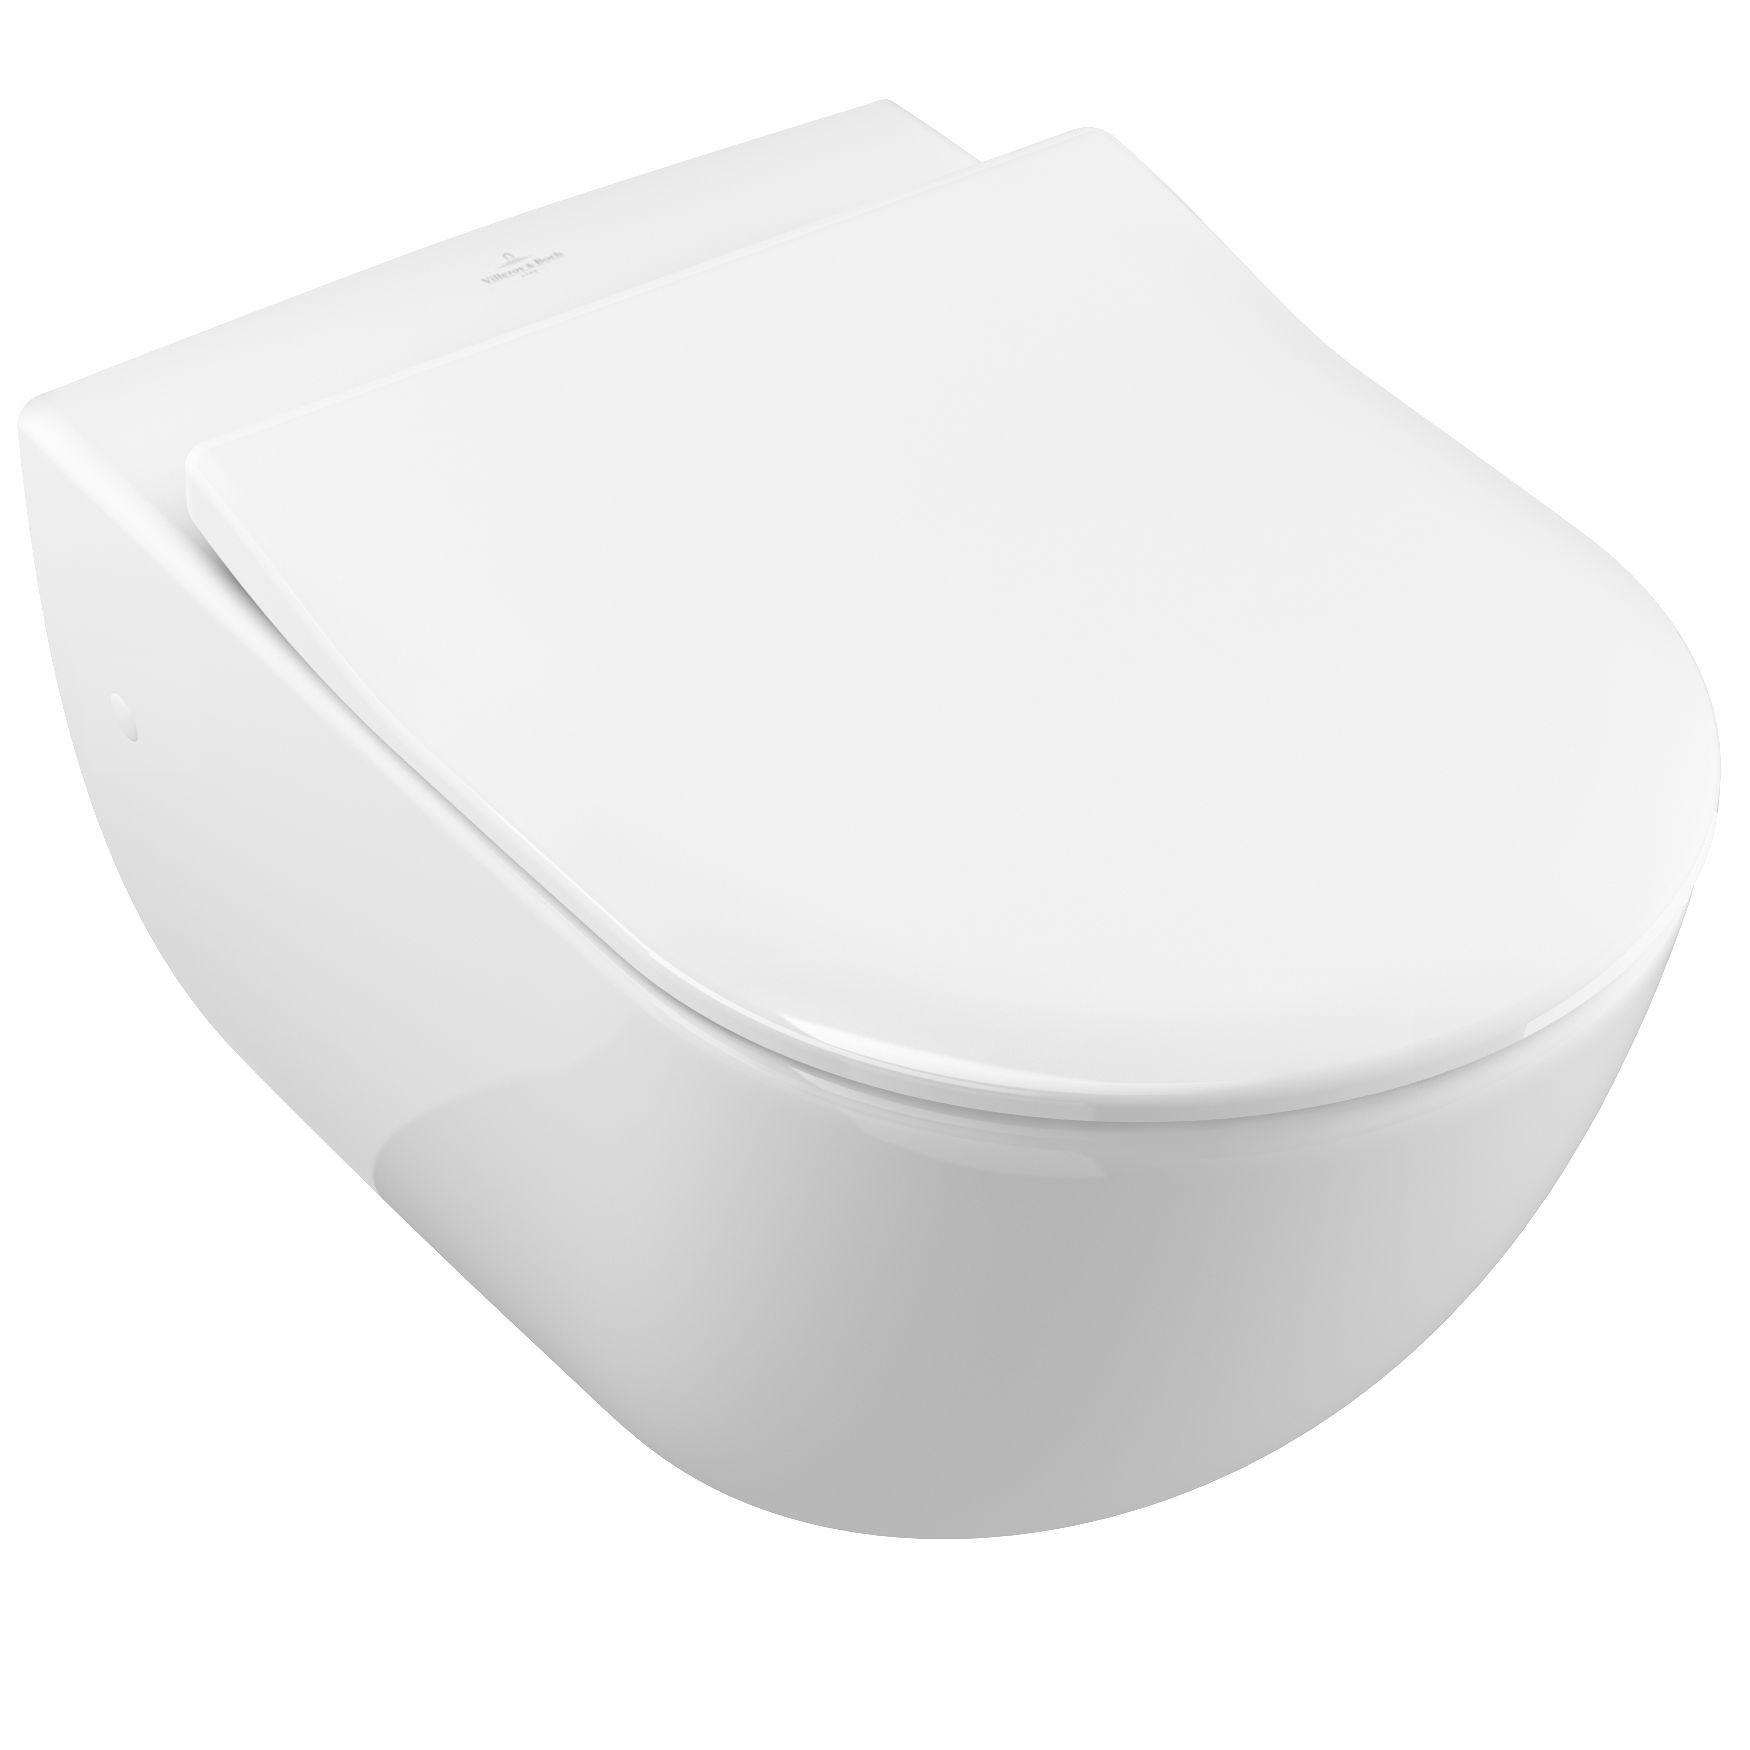 Villeroy & Boch Subway Tiefspül-Wand-WC L:56,5xB:37,5cm Weiß Alpin mit Ceramicplus 660010R1